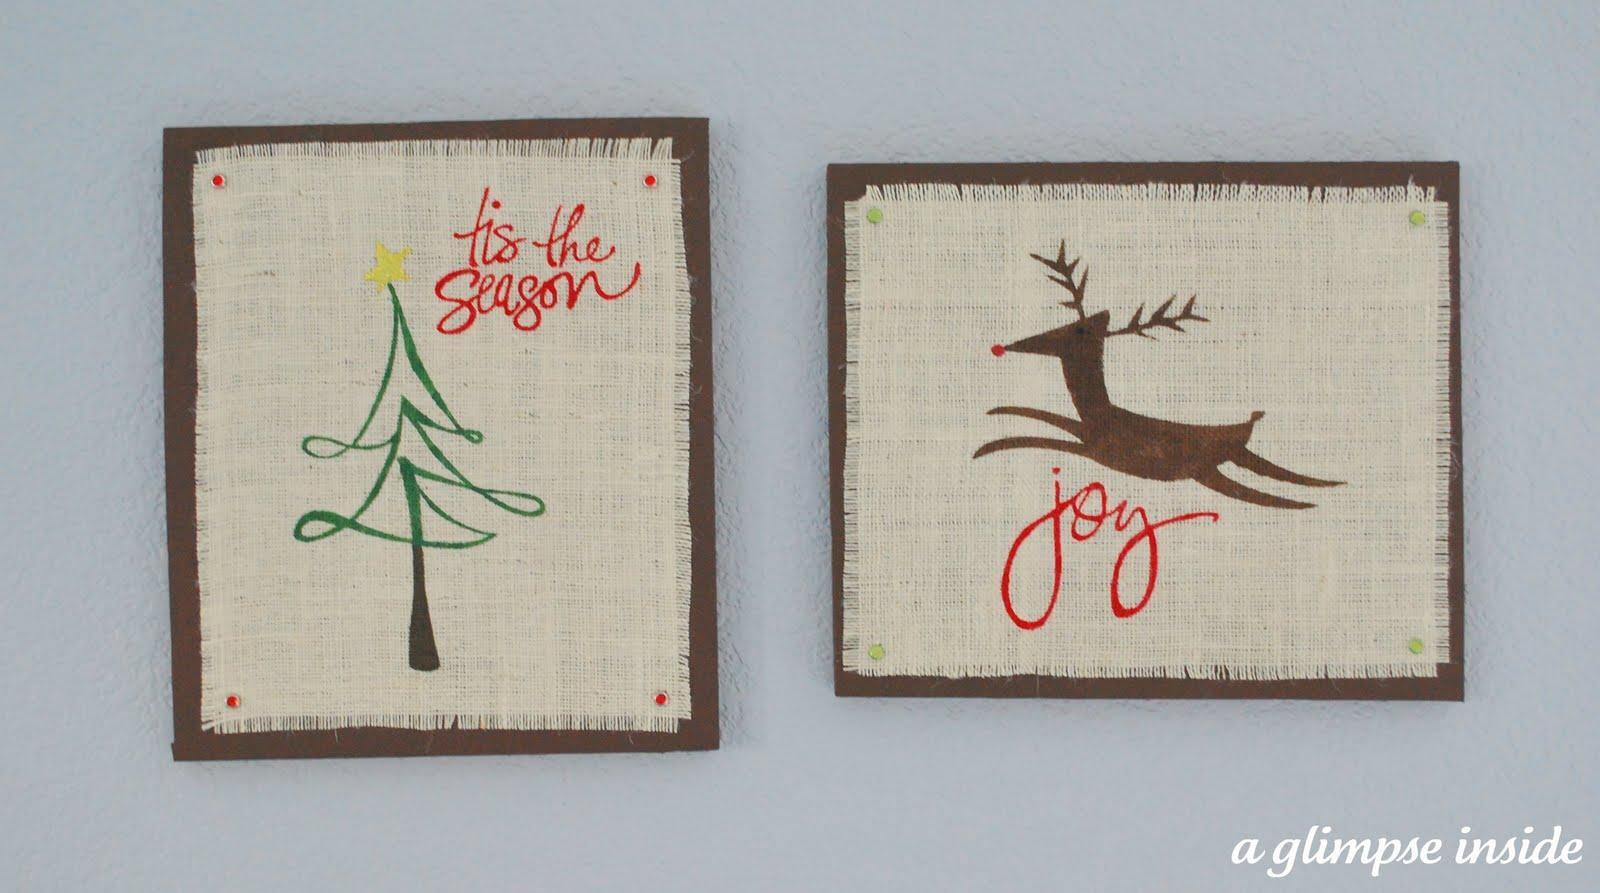 Christmas Wall Art burlap christmas wall art (swell noel #39) - positively splendid